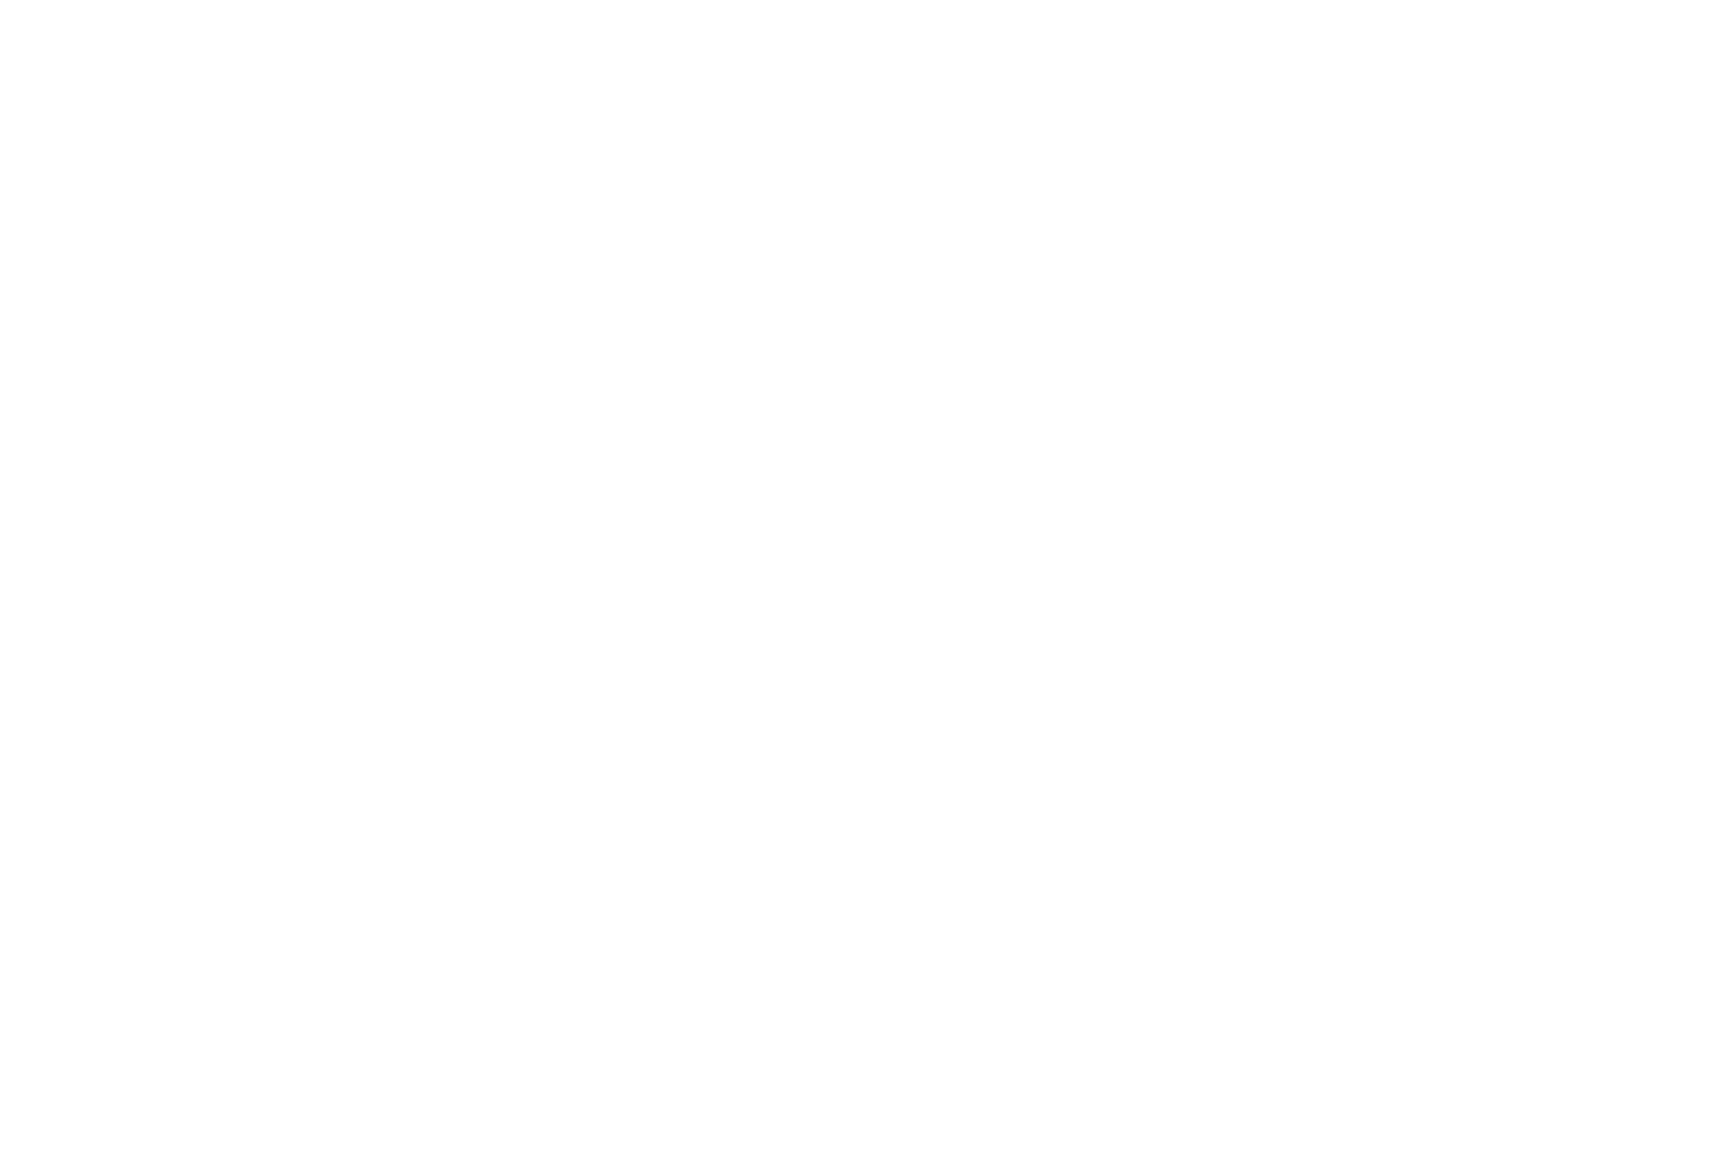 WINNER - INDEPENDENT SPIRIT AWARD - A Night of Horror International Film Festival